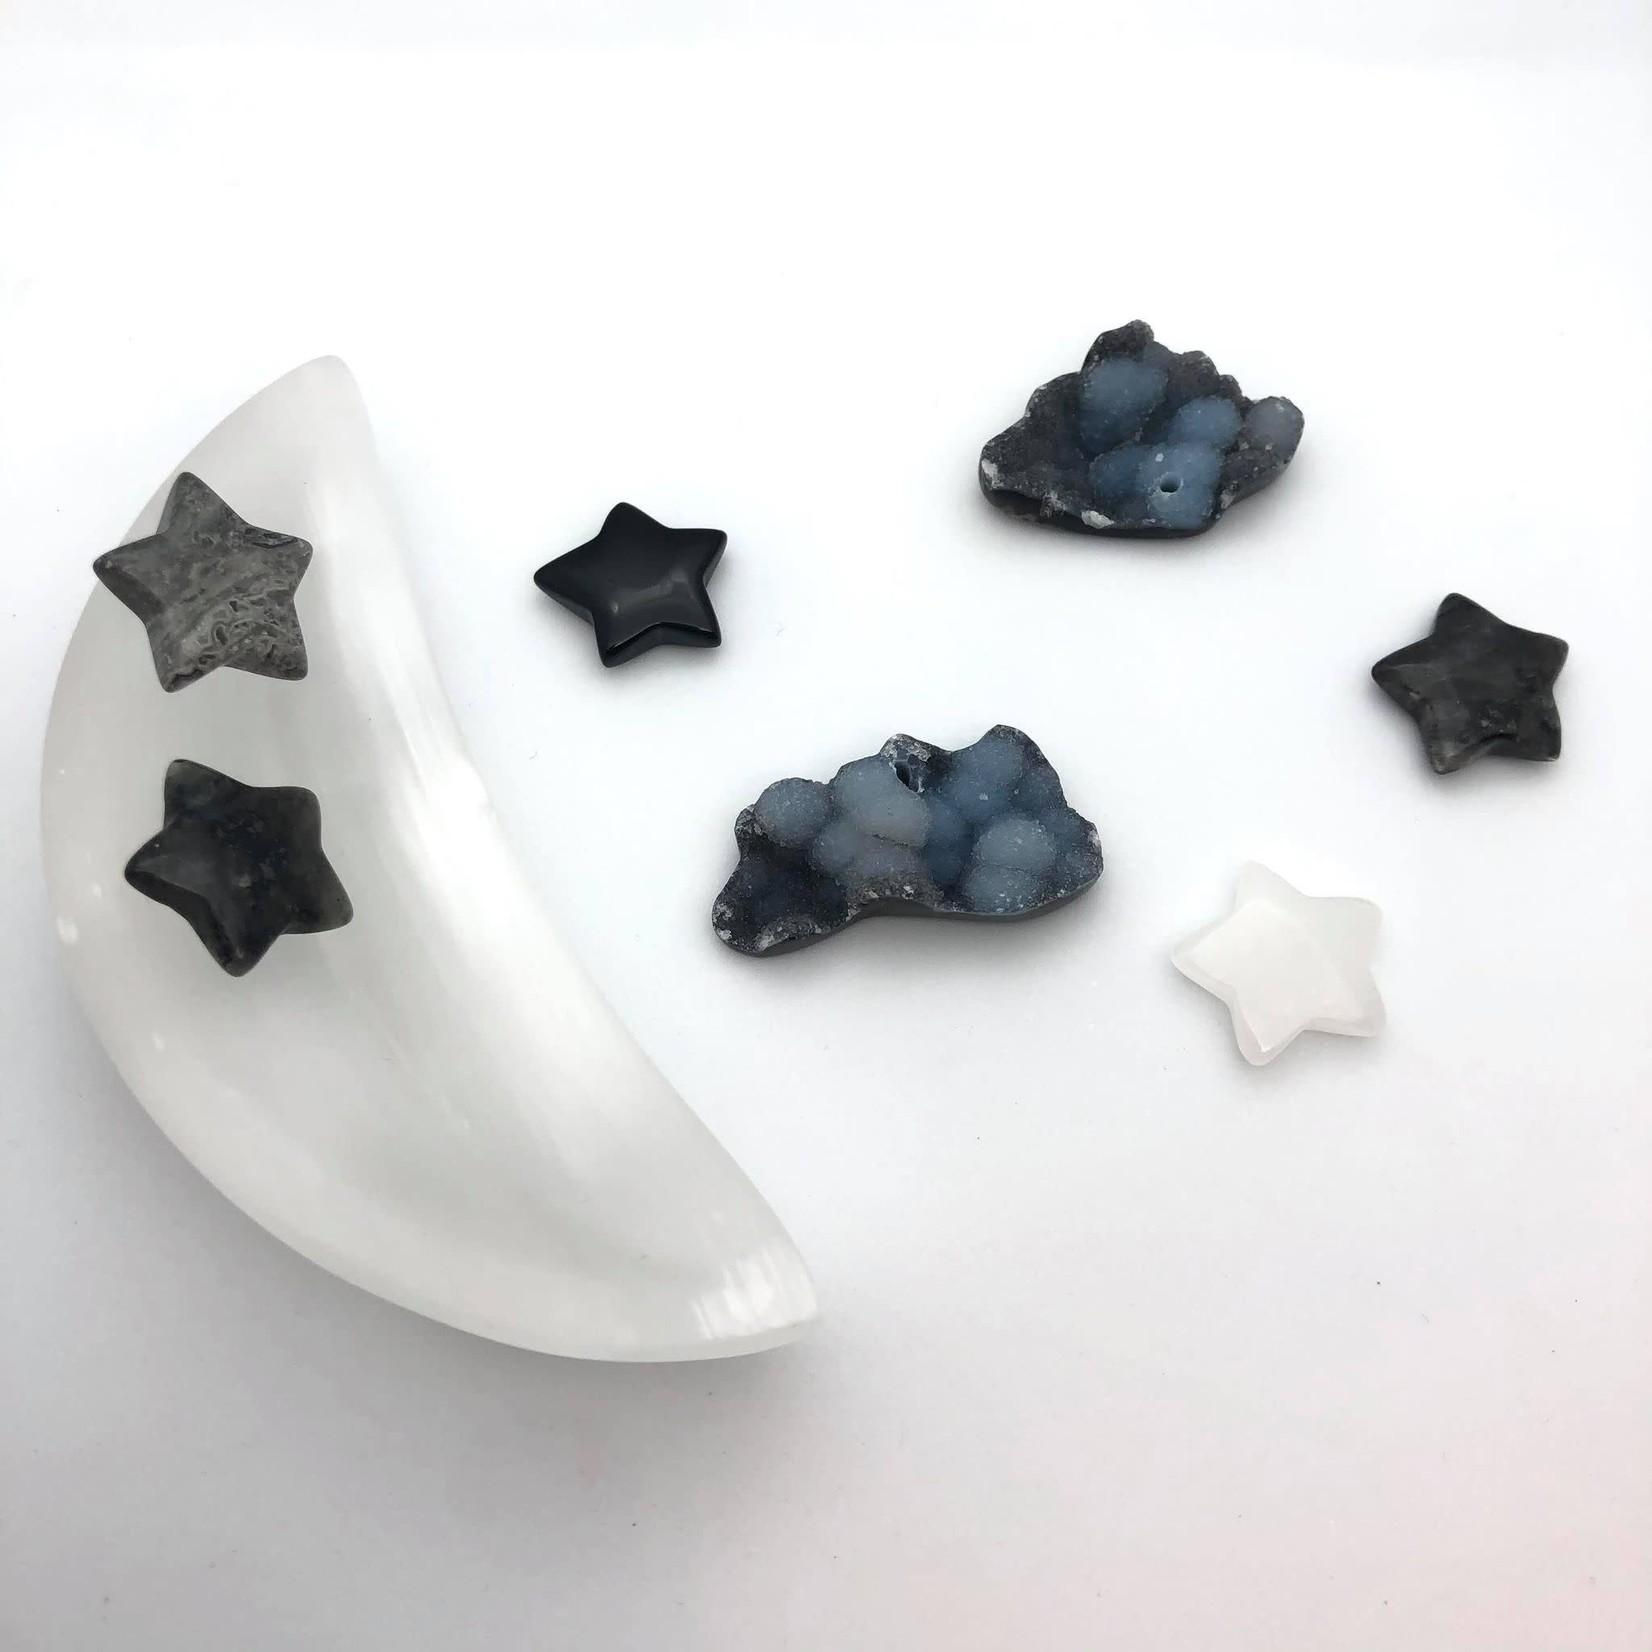 Satin Spar Crystal Bowls